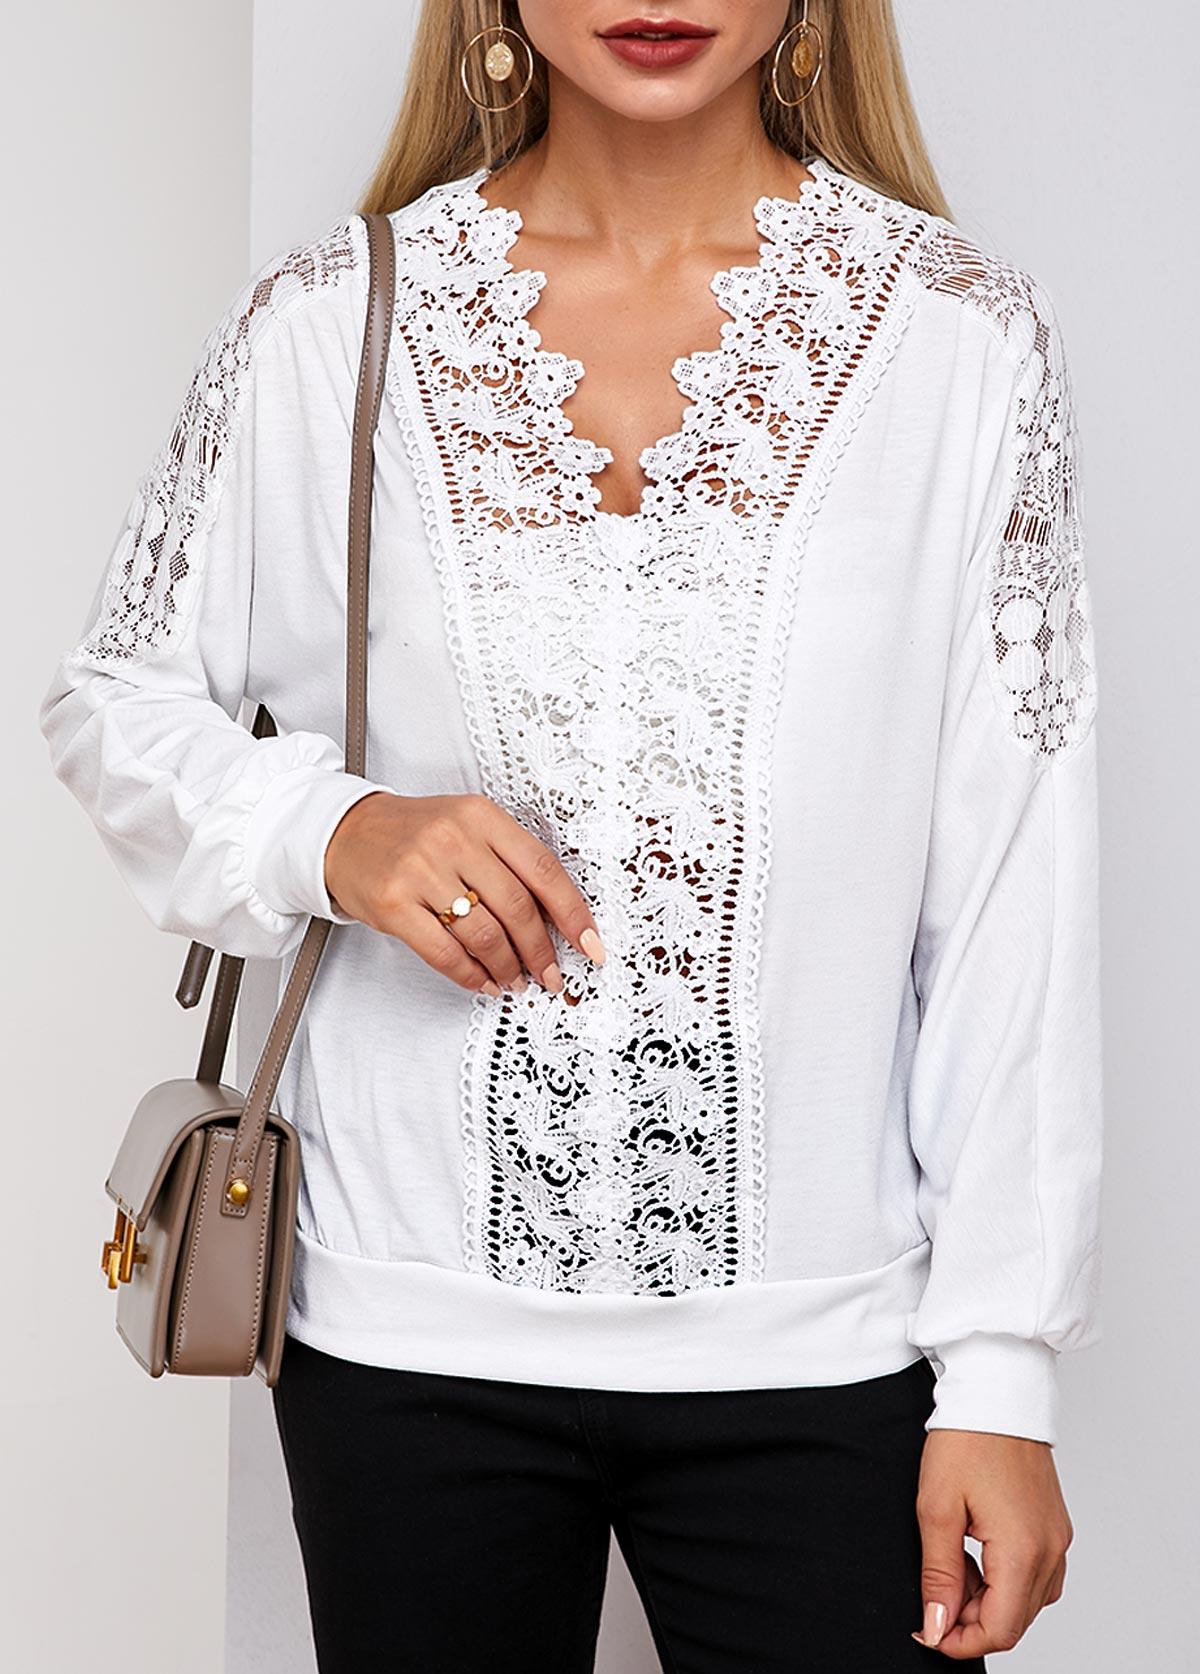 Lace Panel White Long Sleeve T Shirt